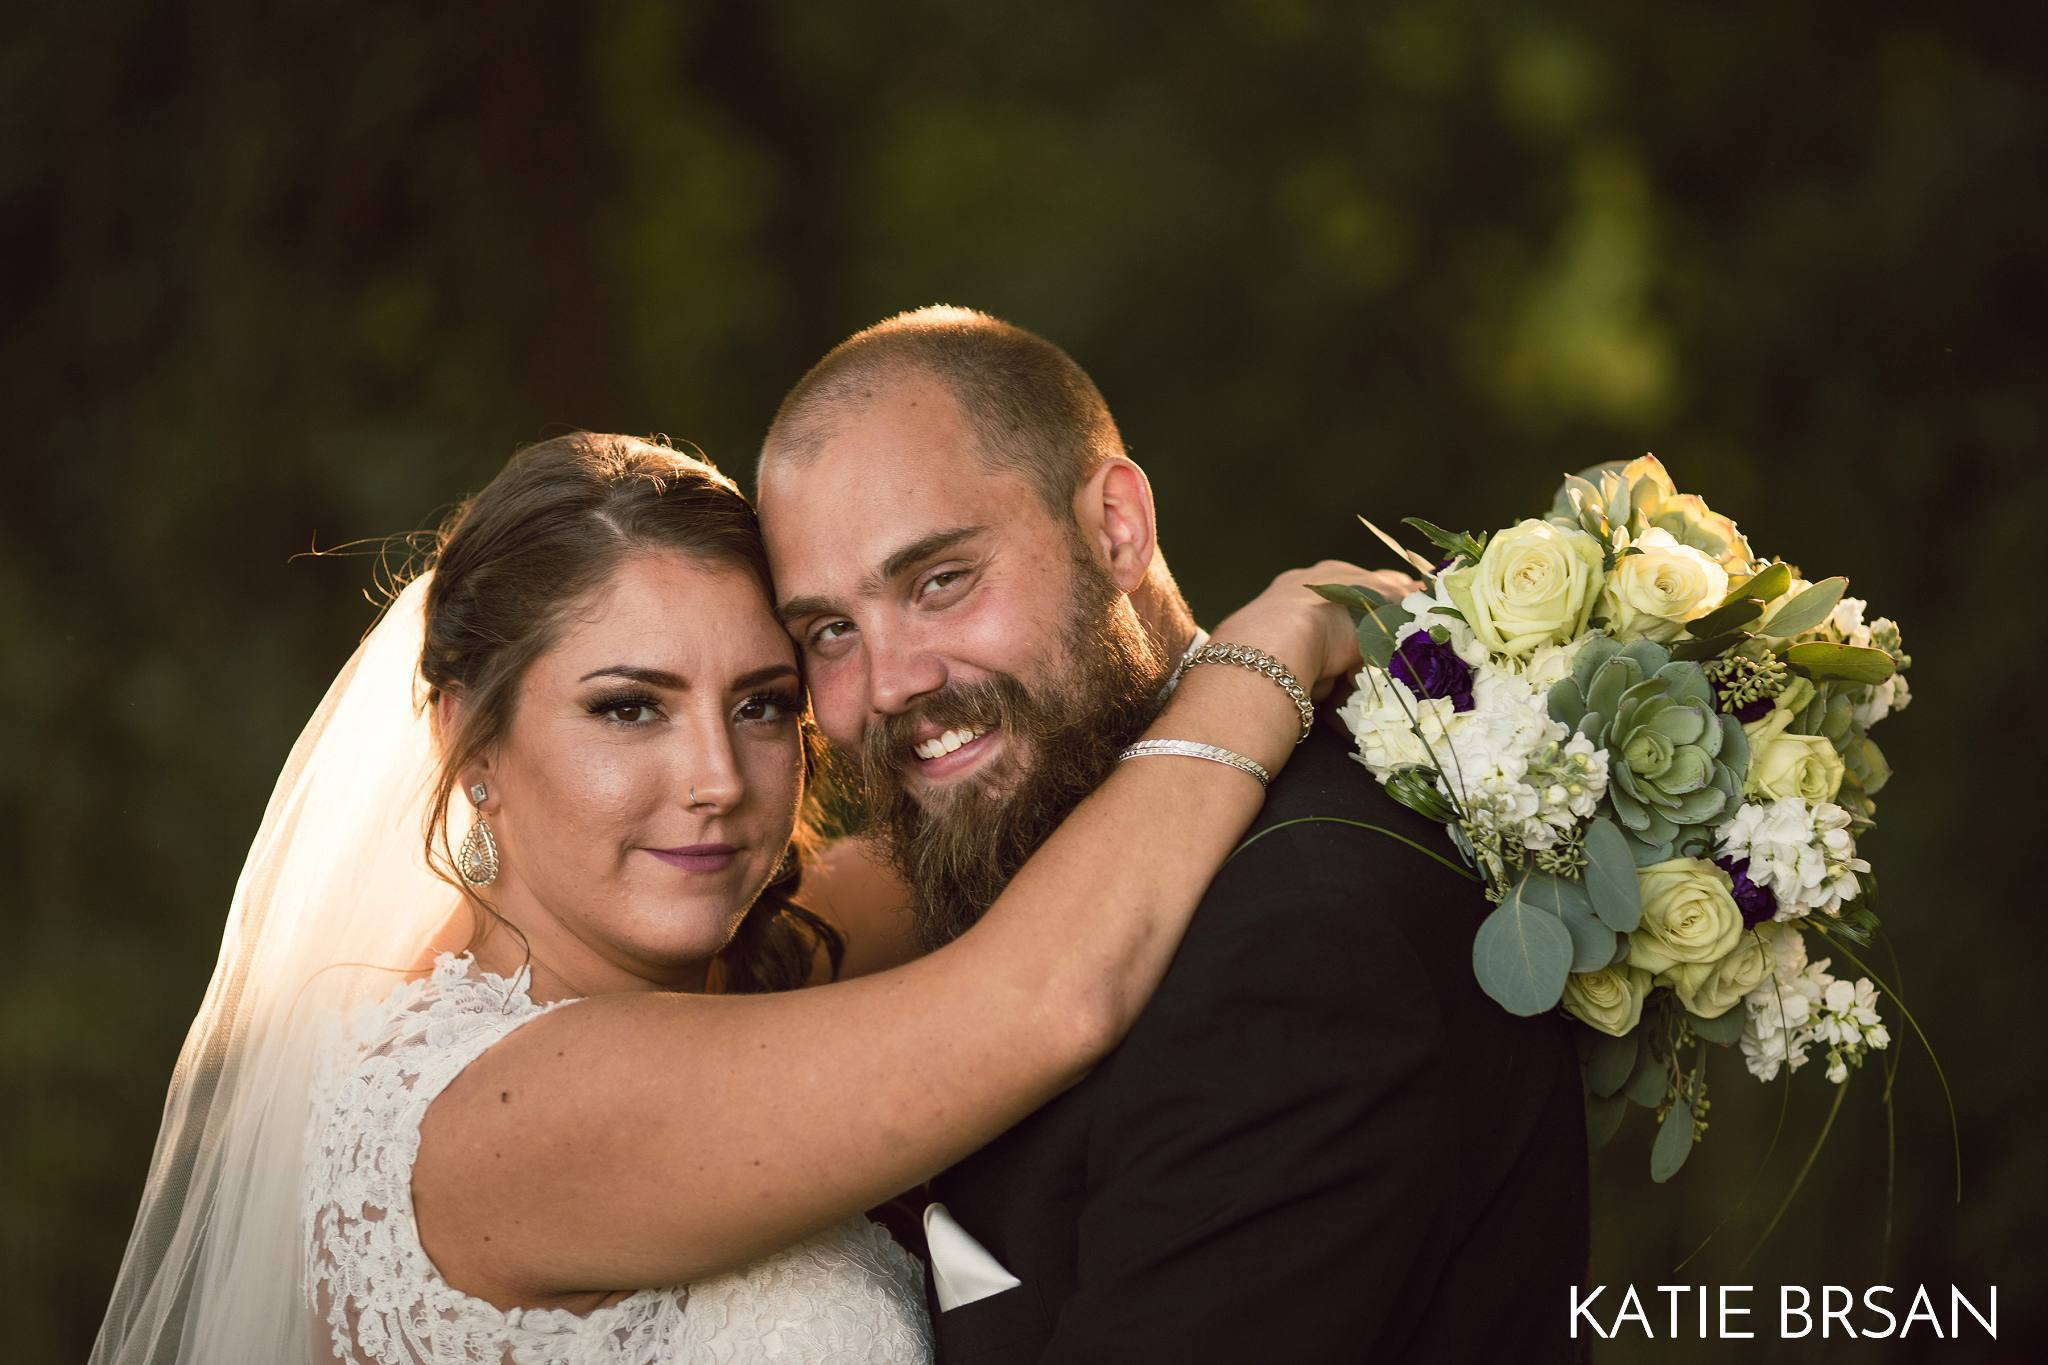 KatieBrsan-Bonfield-Backyard-Wedding_0416.jpg